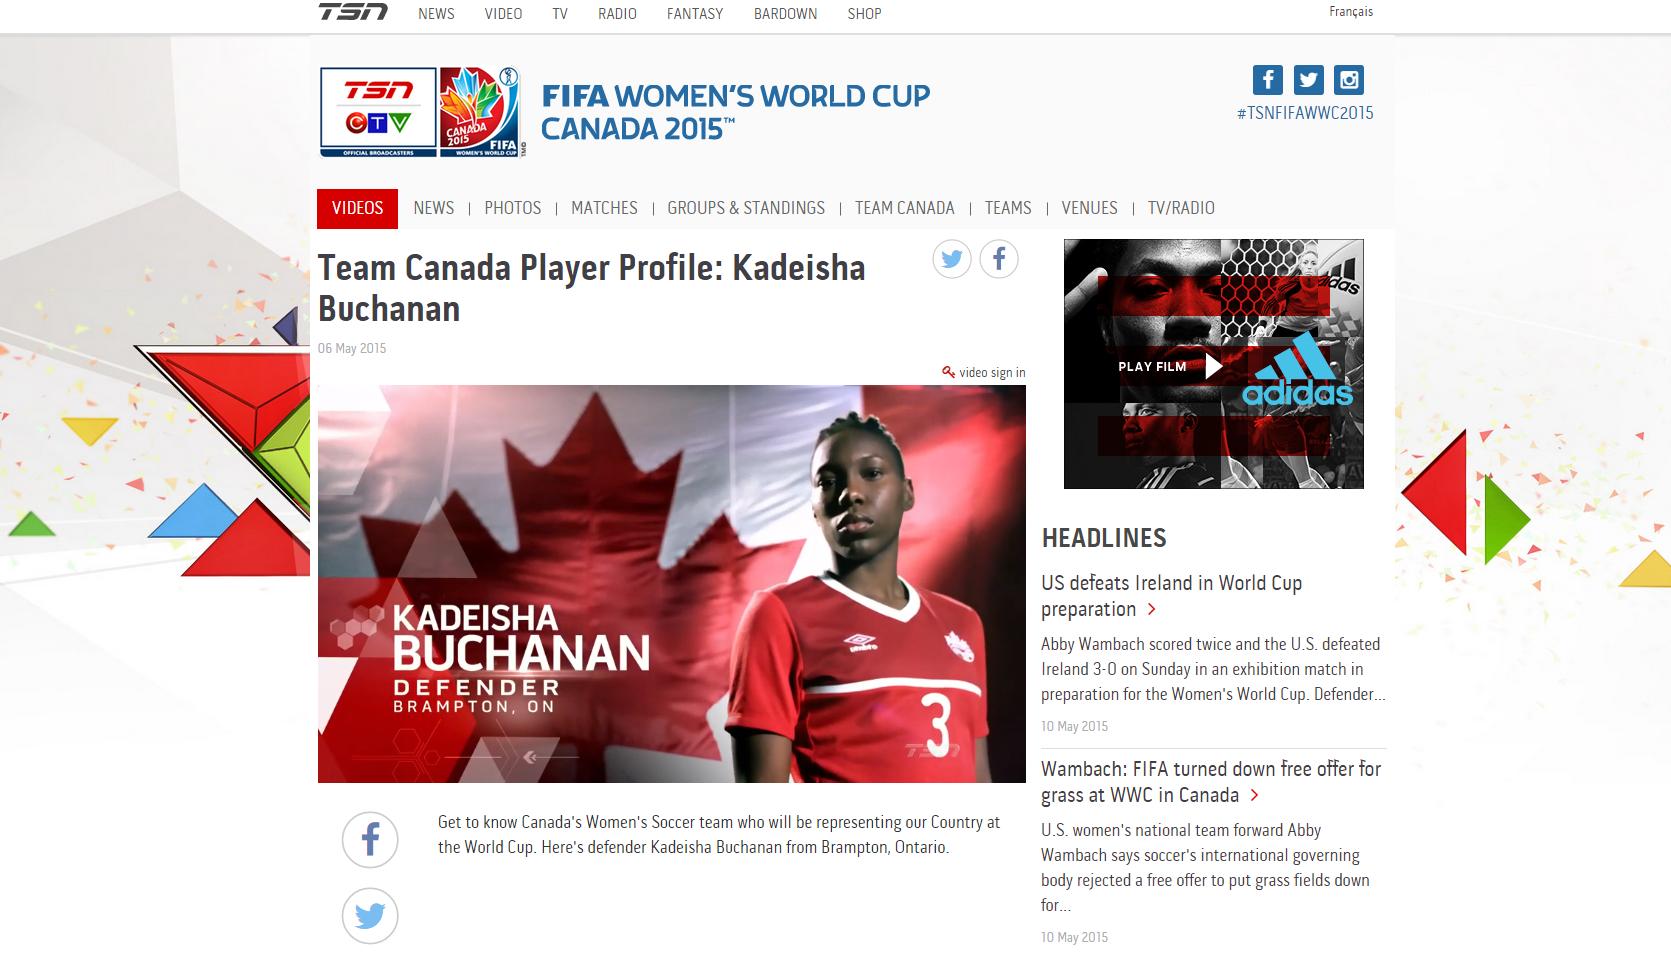 TSN.ca/FIFA is TSN's new digital hub for this summer's FIFA WOMEN'S WORLD CUP CANADA 2015™